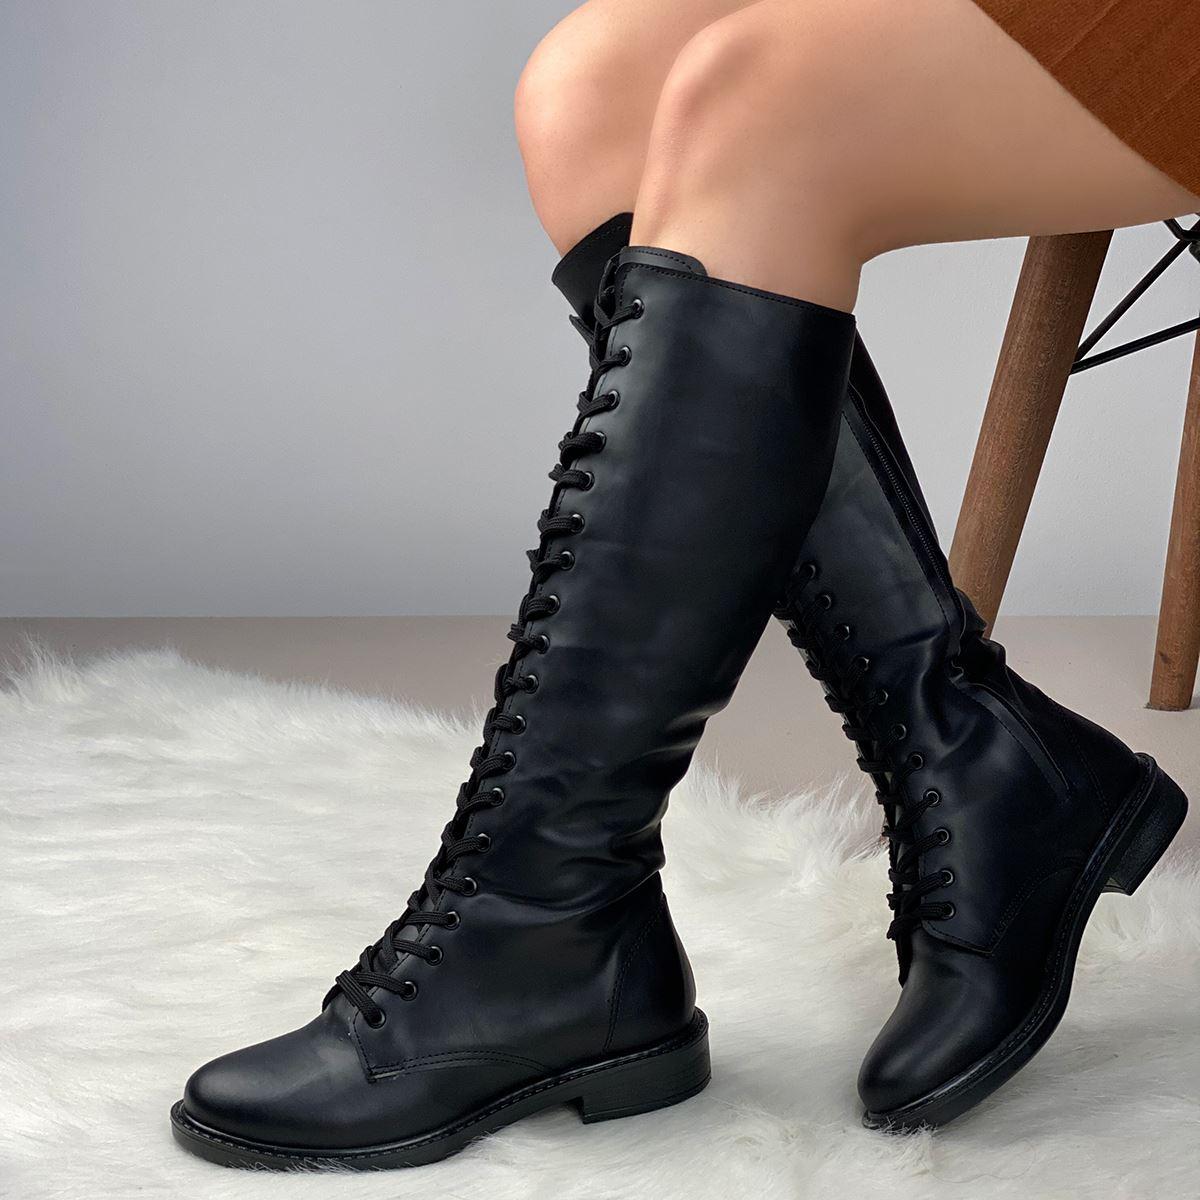 Siyah Bağcıklı Çizme AYK208